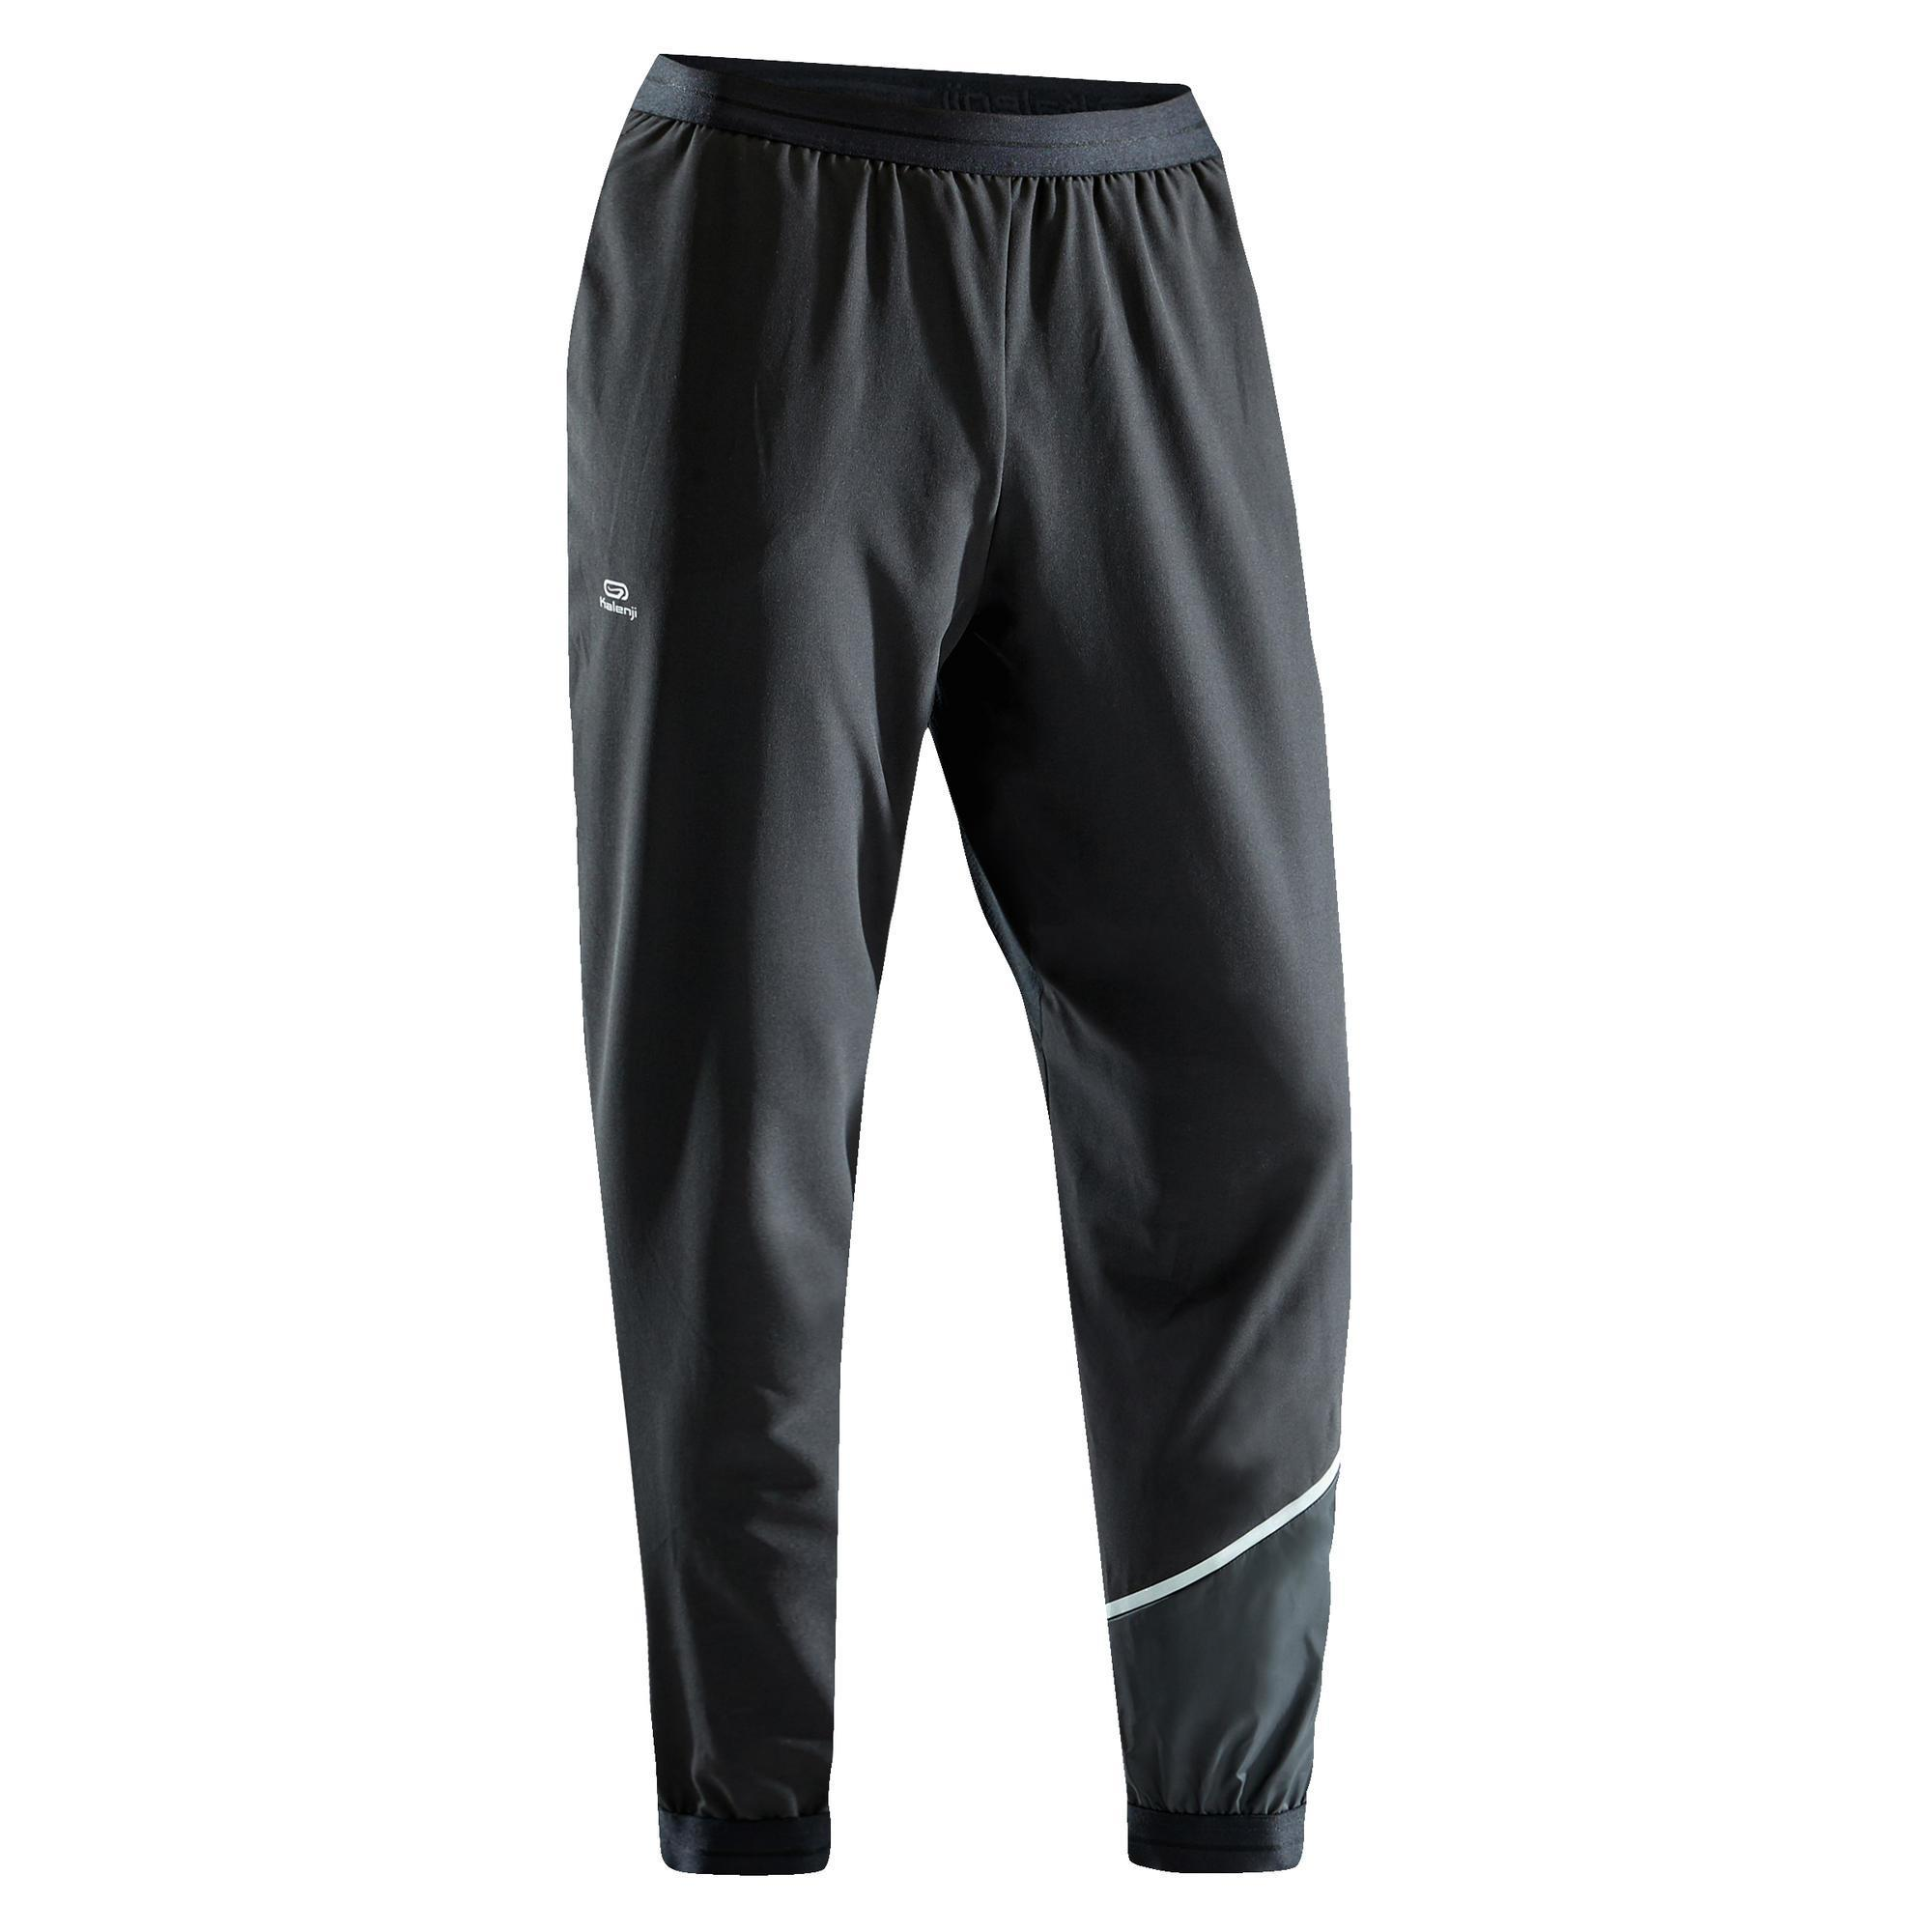 Laufhose Run Dry Herren schwarz | Sportbekleidung > Sporthosen > Laufhosen | Kalenji